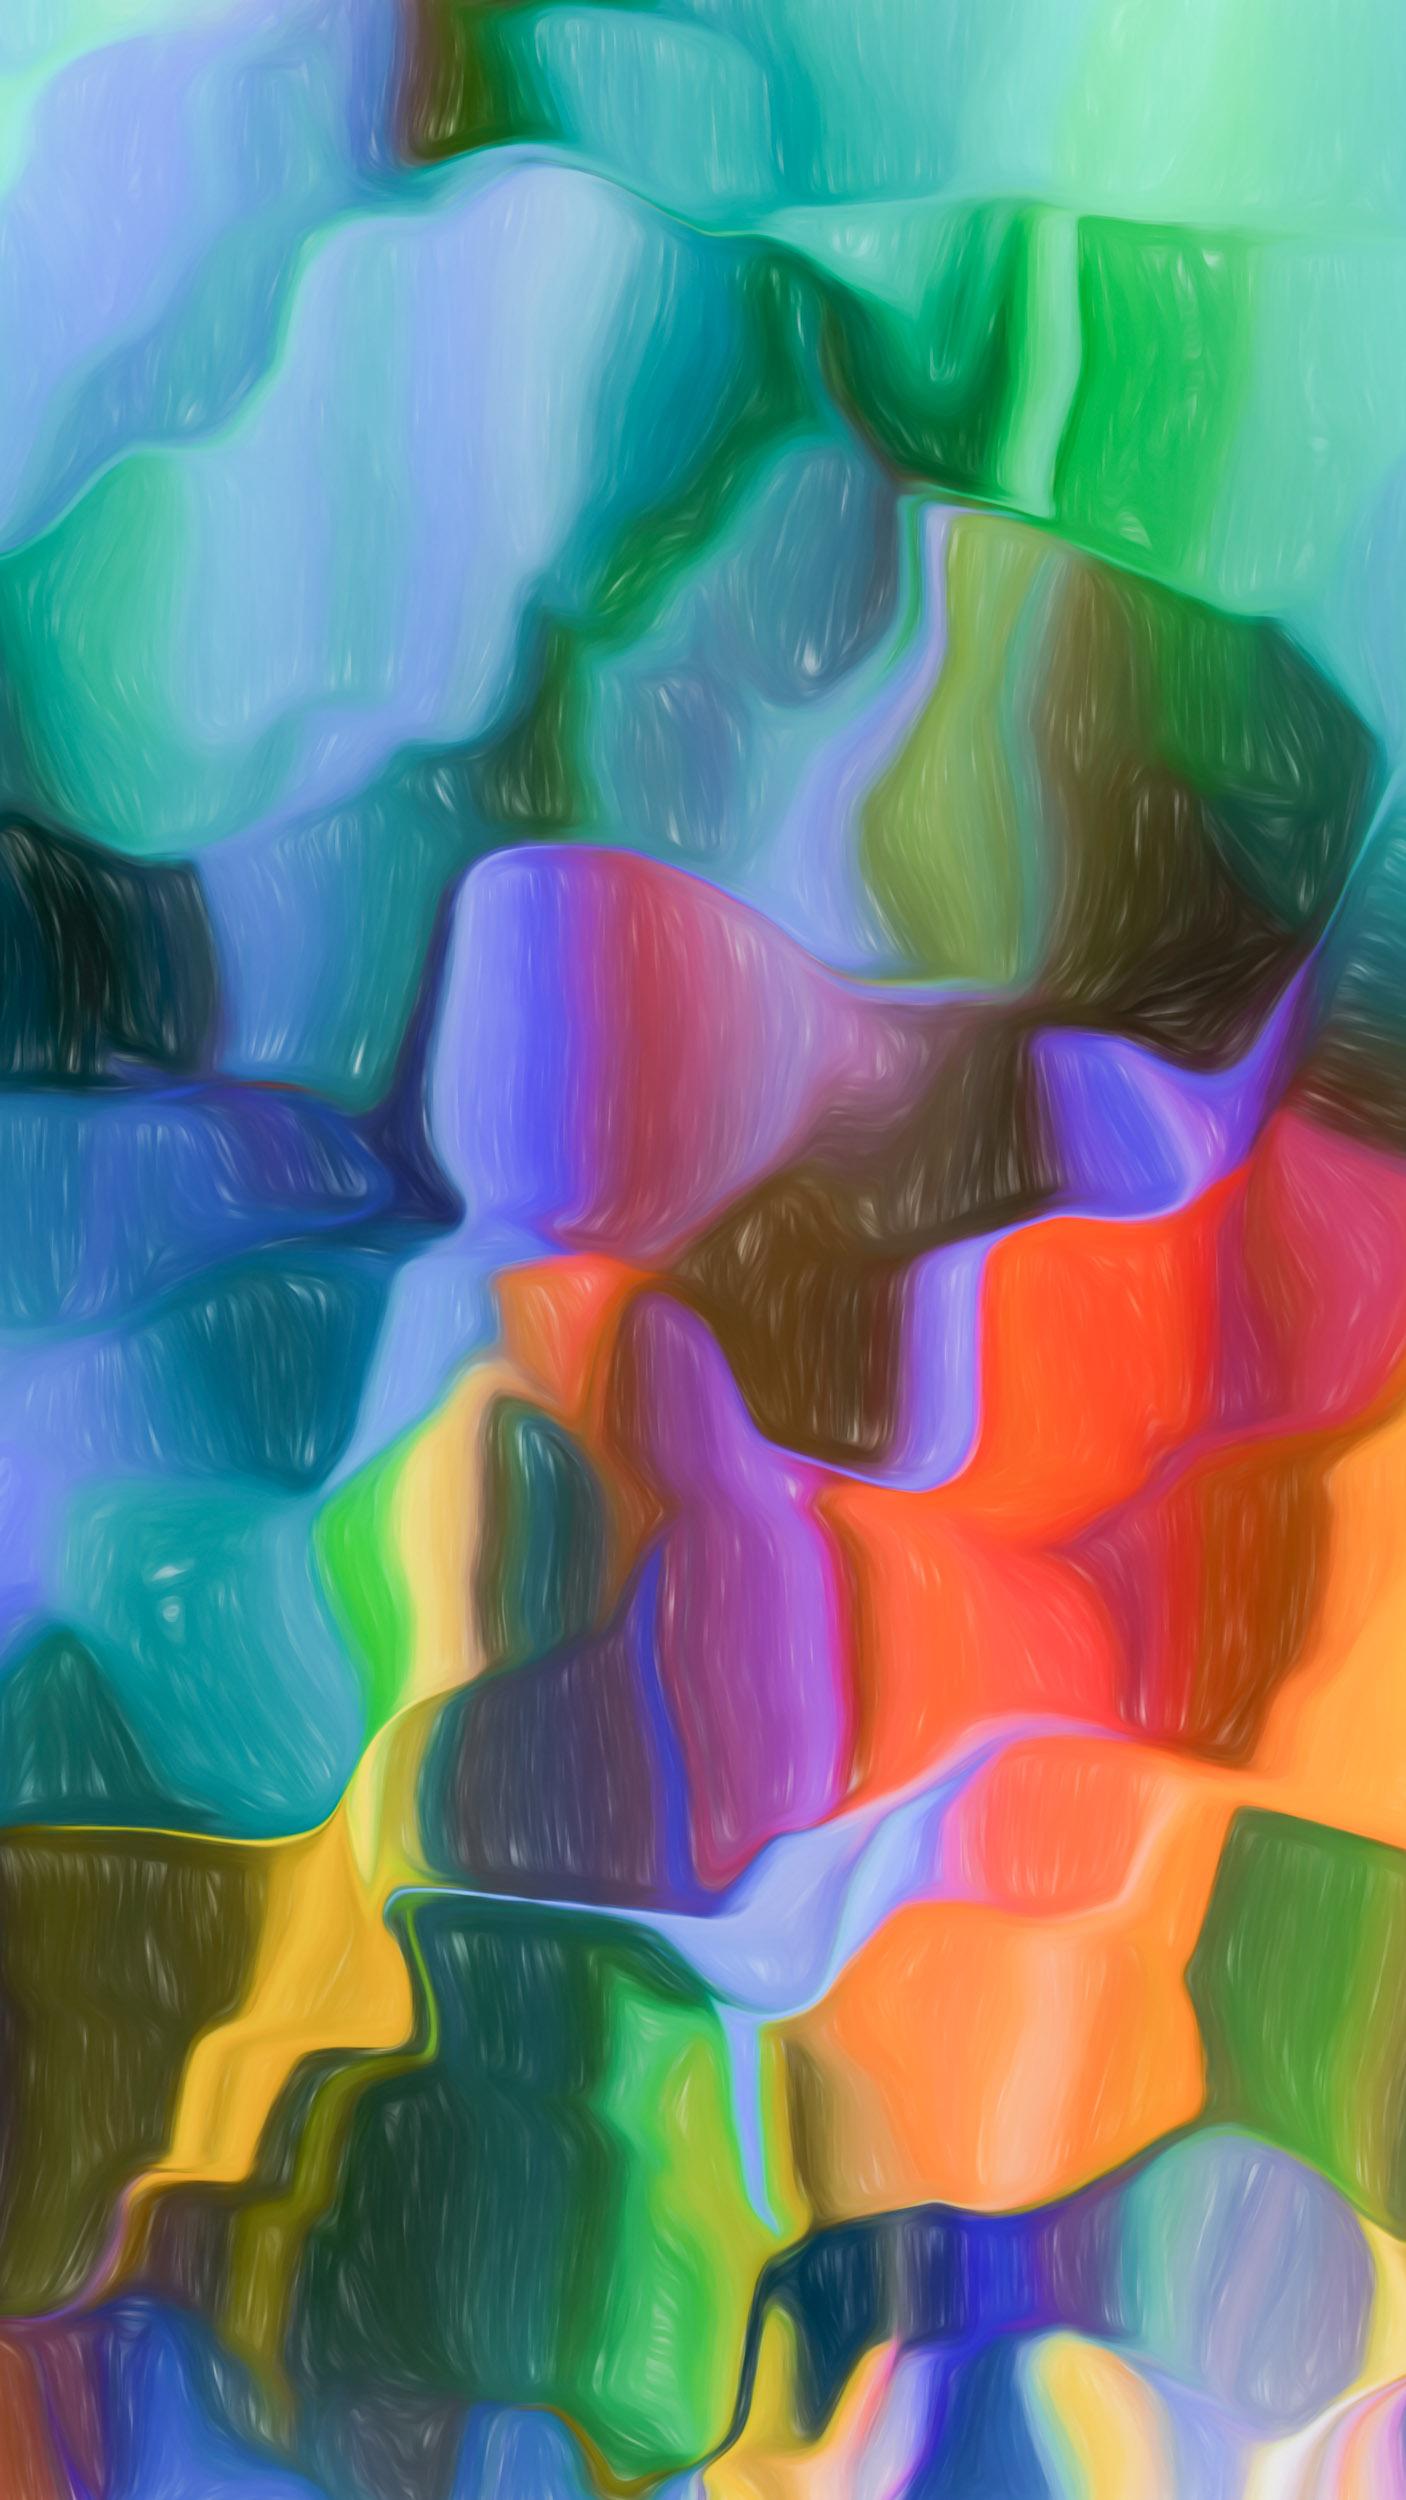 """World of Color Narrowed"" - Photography Artist Kevin Sibbitt"